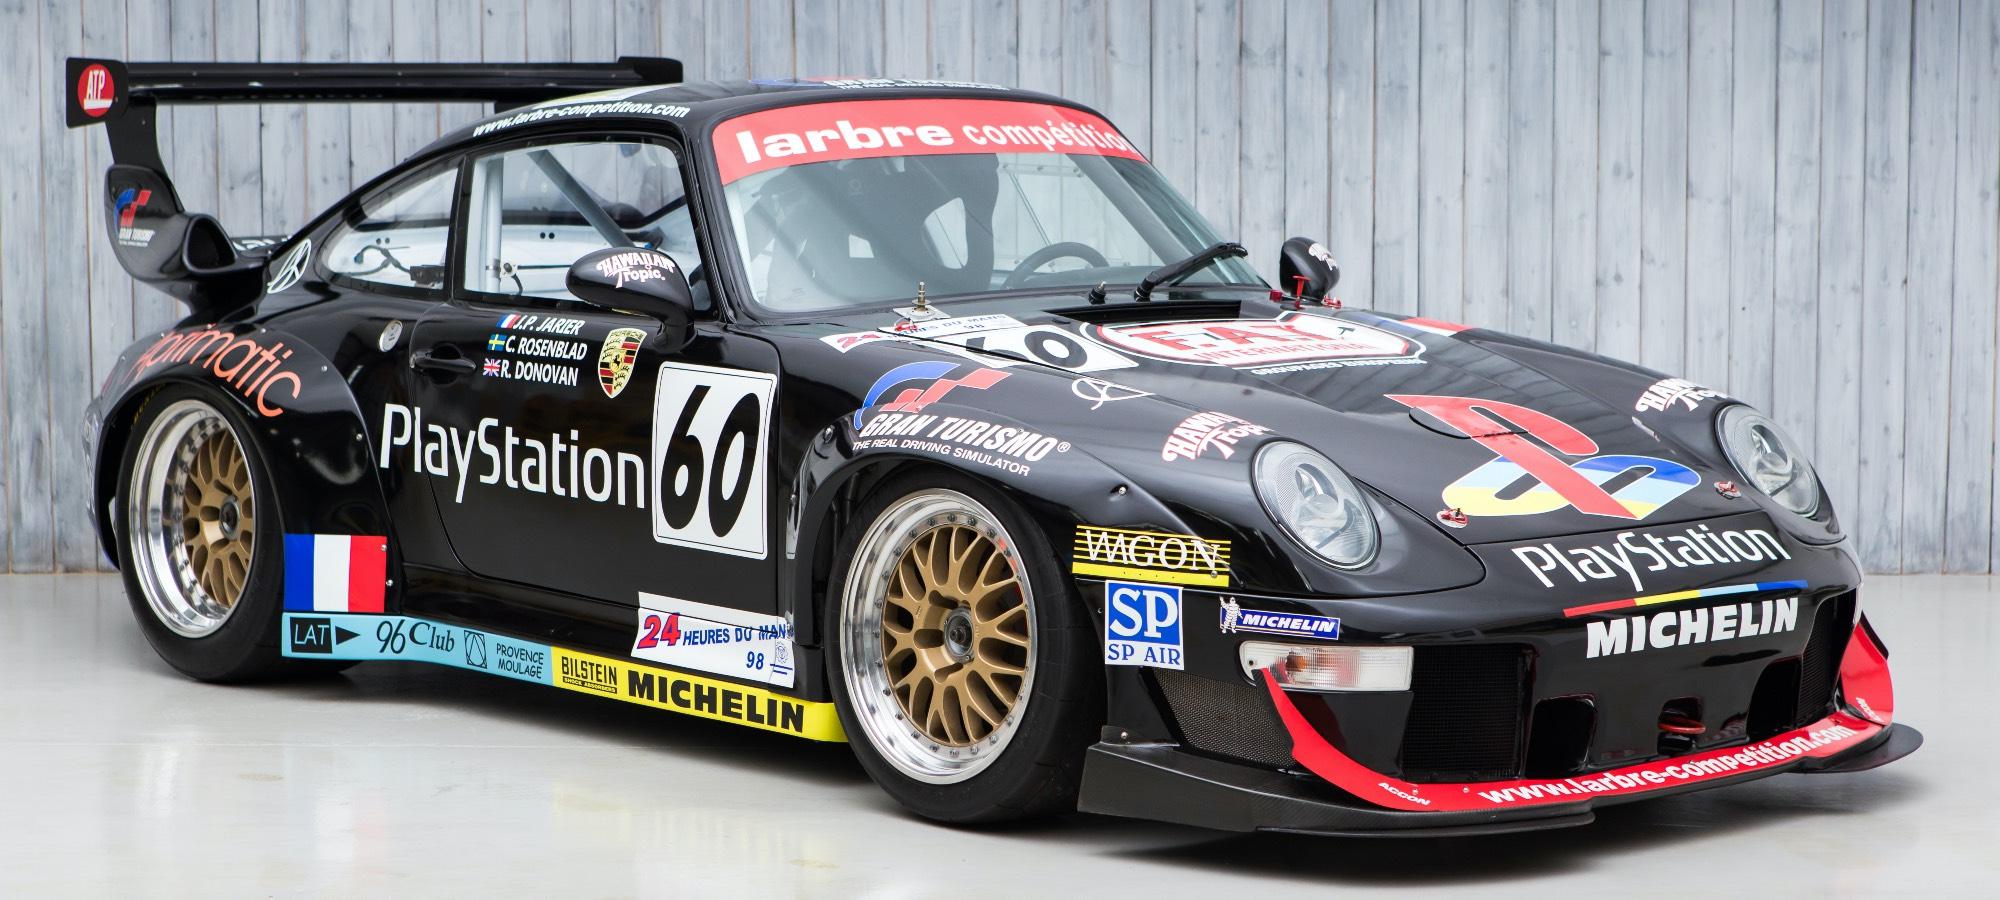 The Ex - Larbre Competition, Sony PlayStation, Multiple Le Mans 24 Hours 1997 Porsche 993 GT2 Evo